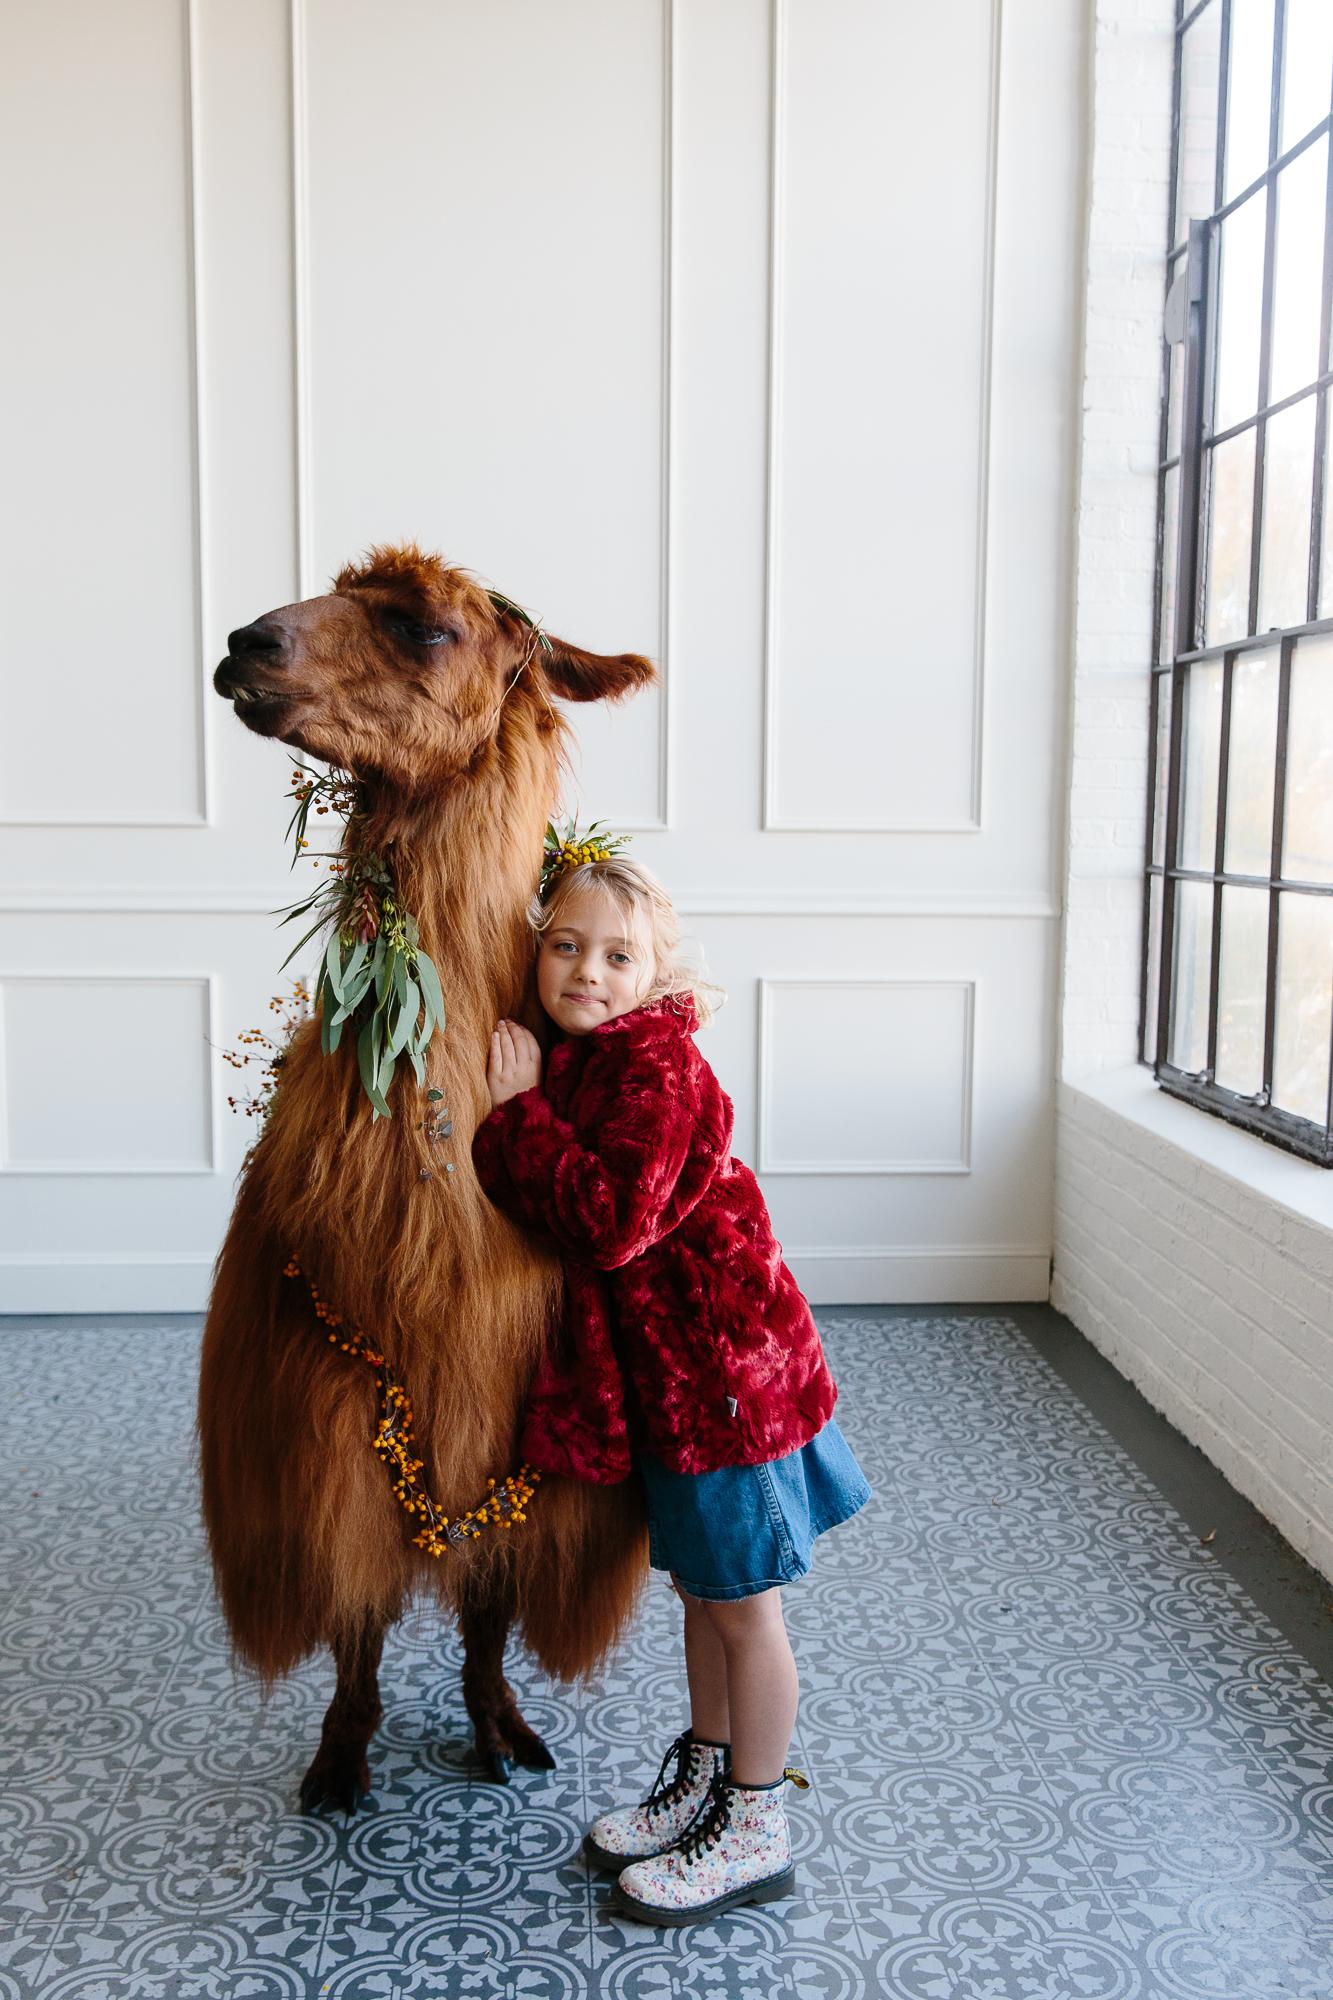 llama_portland_animal-35.JPG